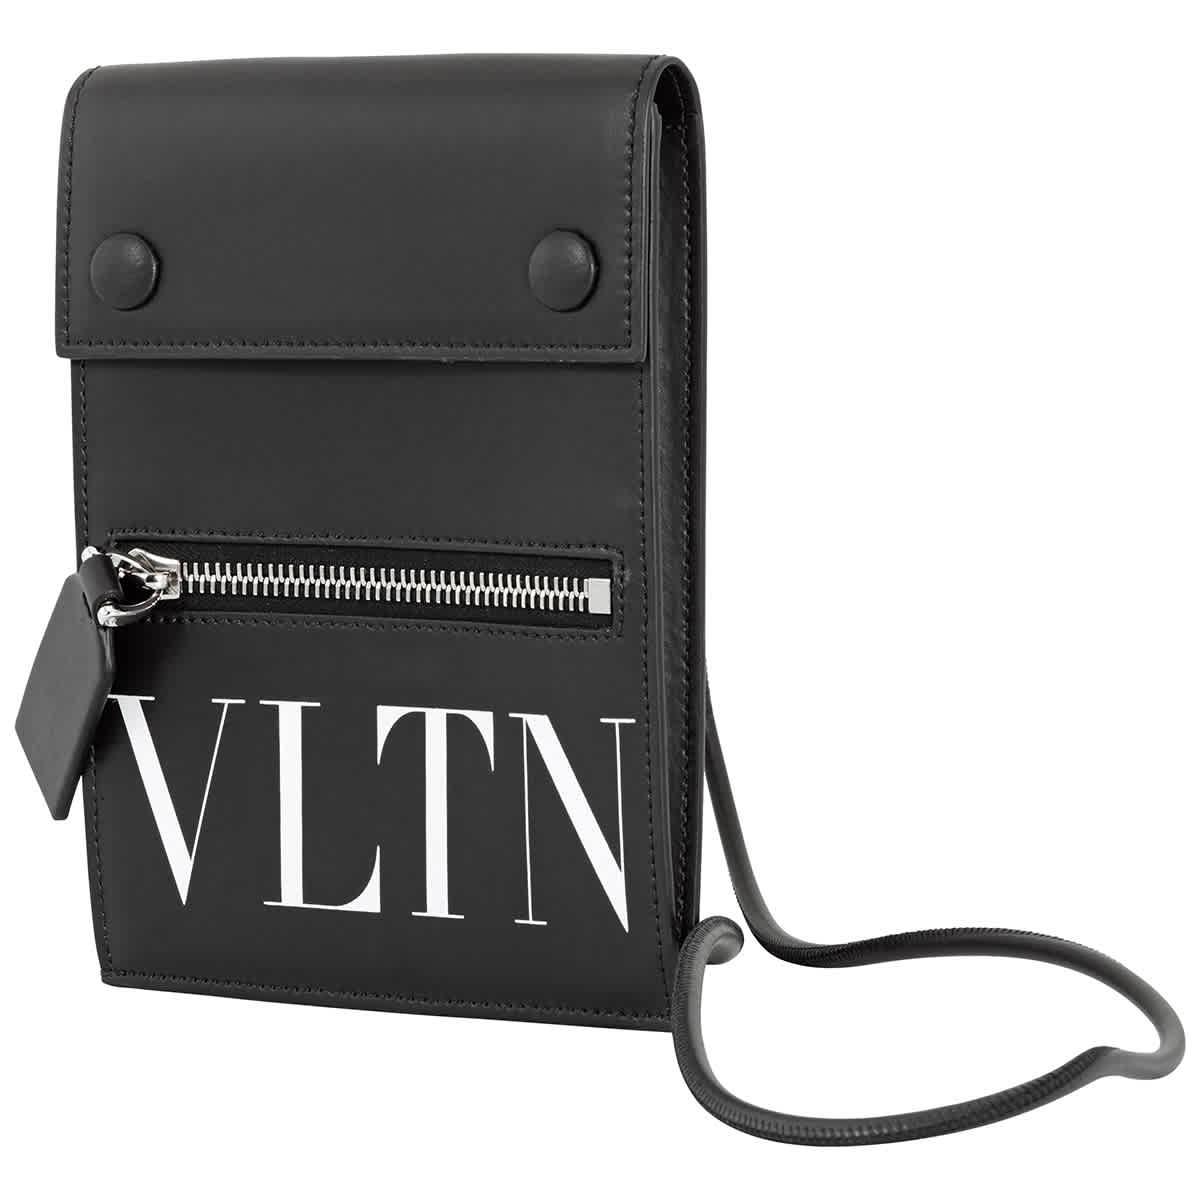 Valentino Garavani Black Vltn Phone Case With Neck Strap